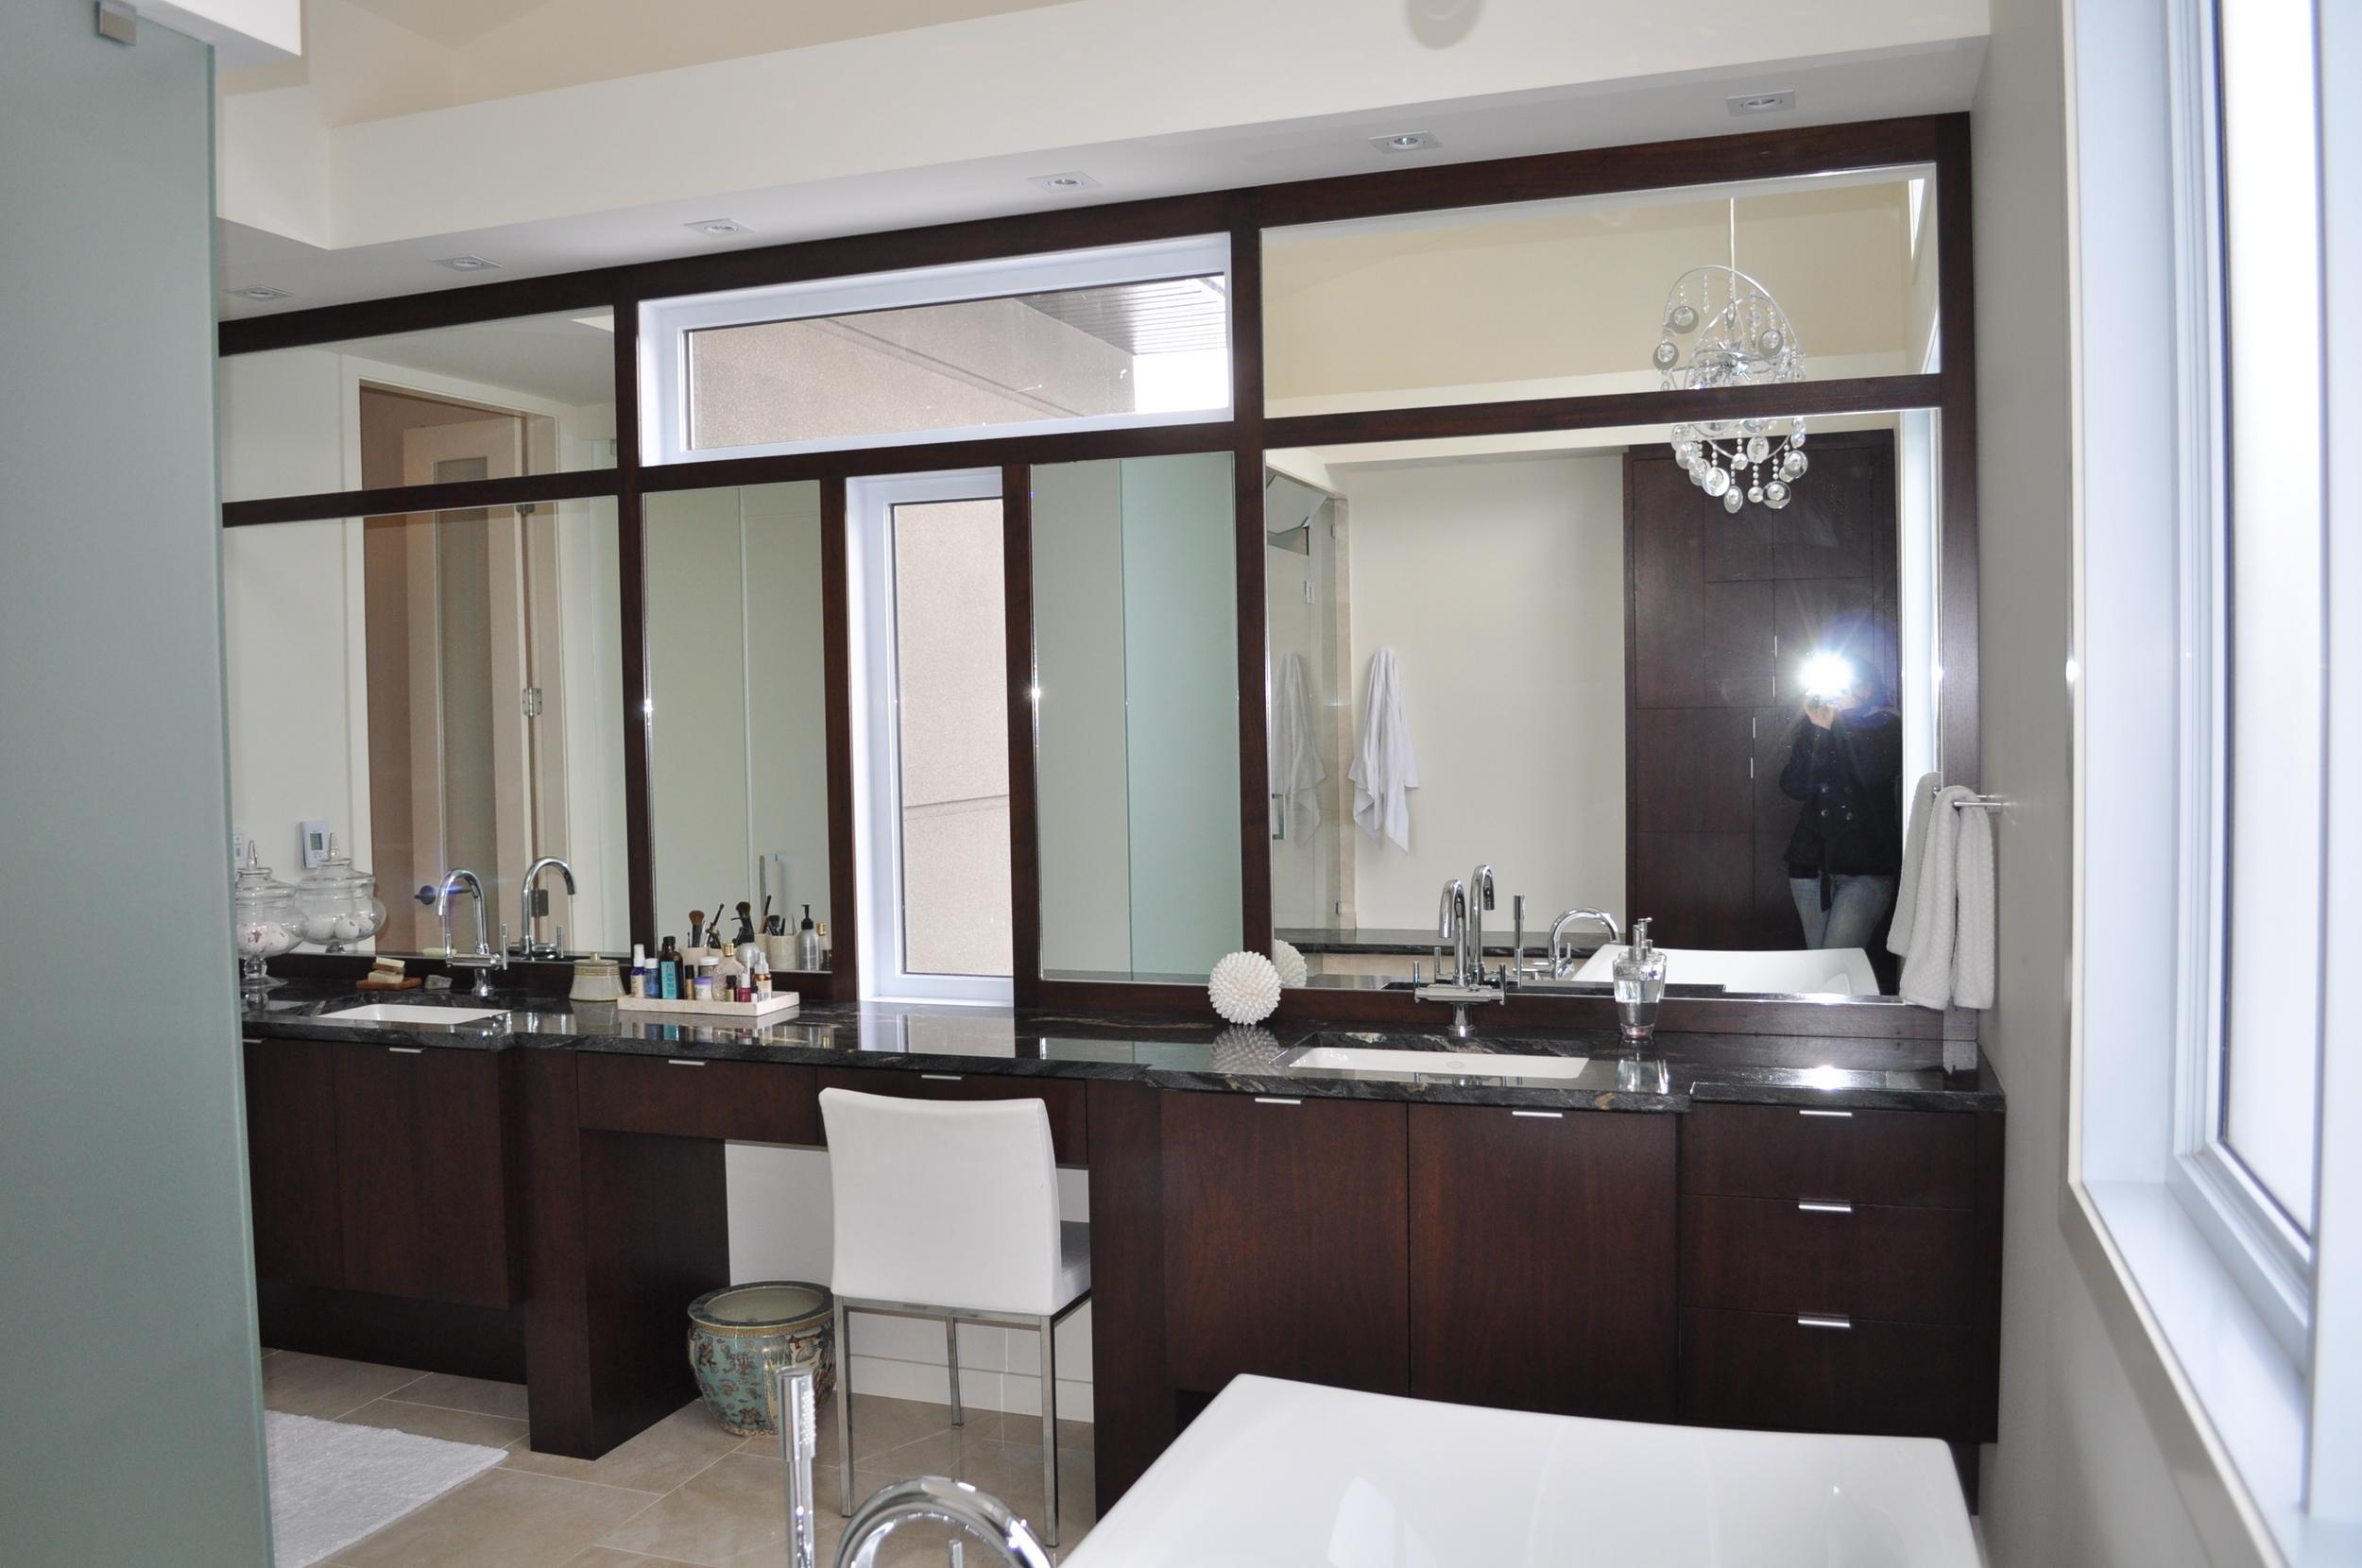 walnut-wood-custom-master-bath-ensuite-cabinetry-makeup-desk.jpg.JPG